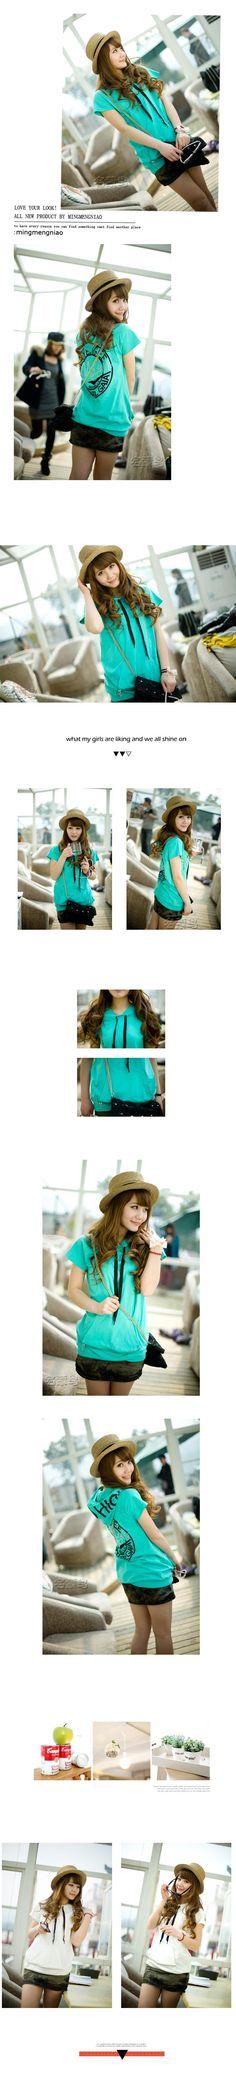 Fashion Fashion Styles, Asian, Movie Posters, Film Poster, Billboard, Film Posters, Style Fashion